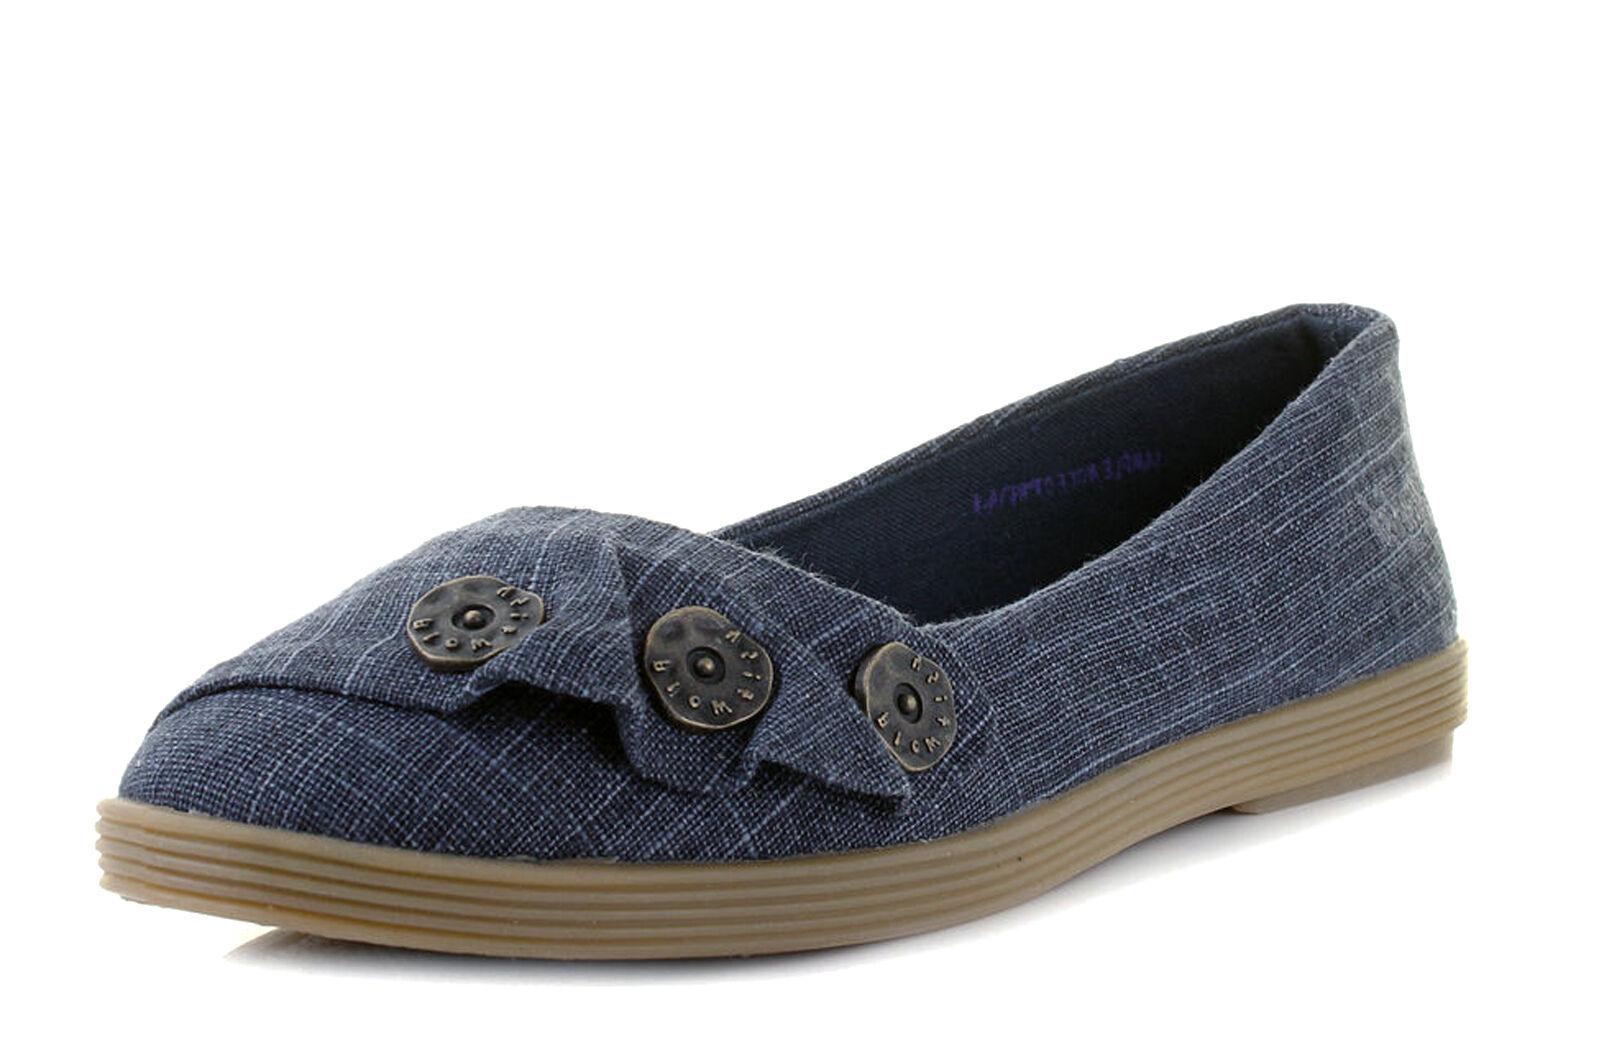 Blowfish NEW Garden navy cozumel linen womens flat ballet fashion shoes size 3-8